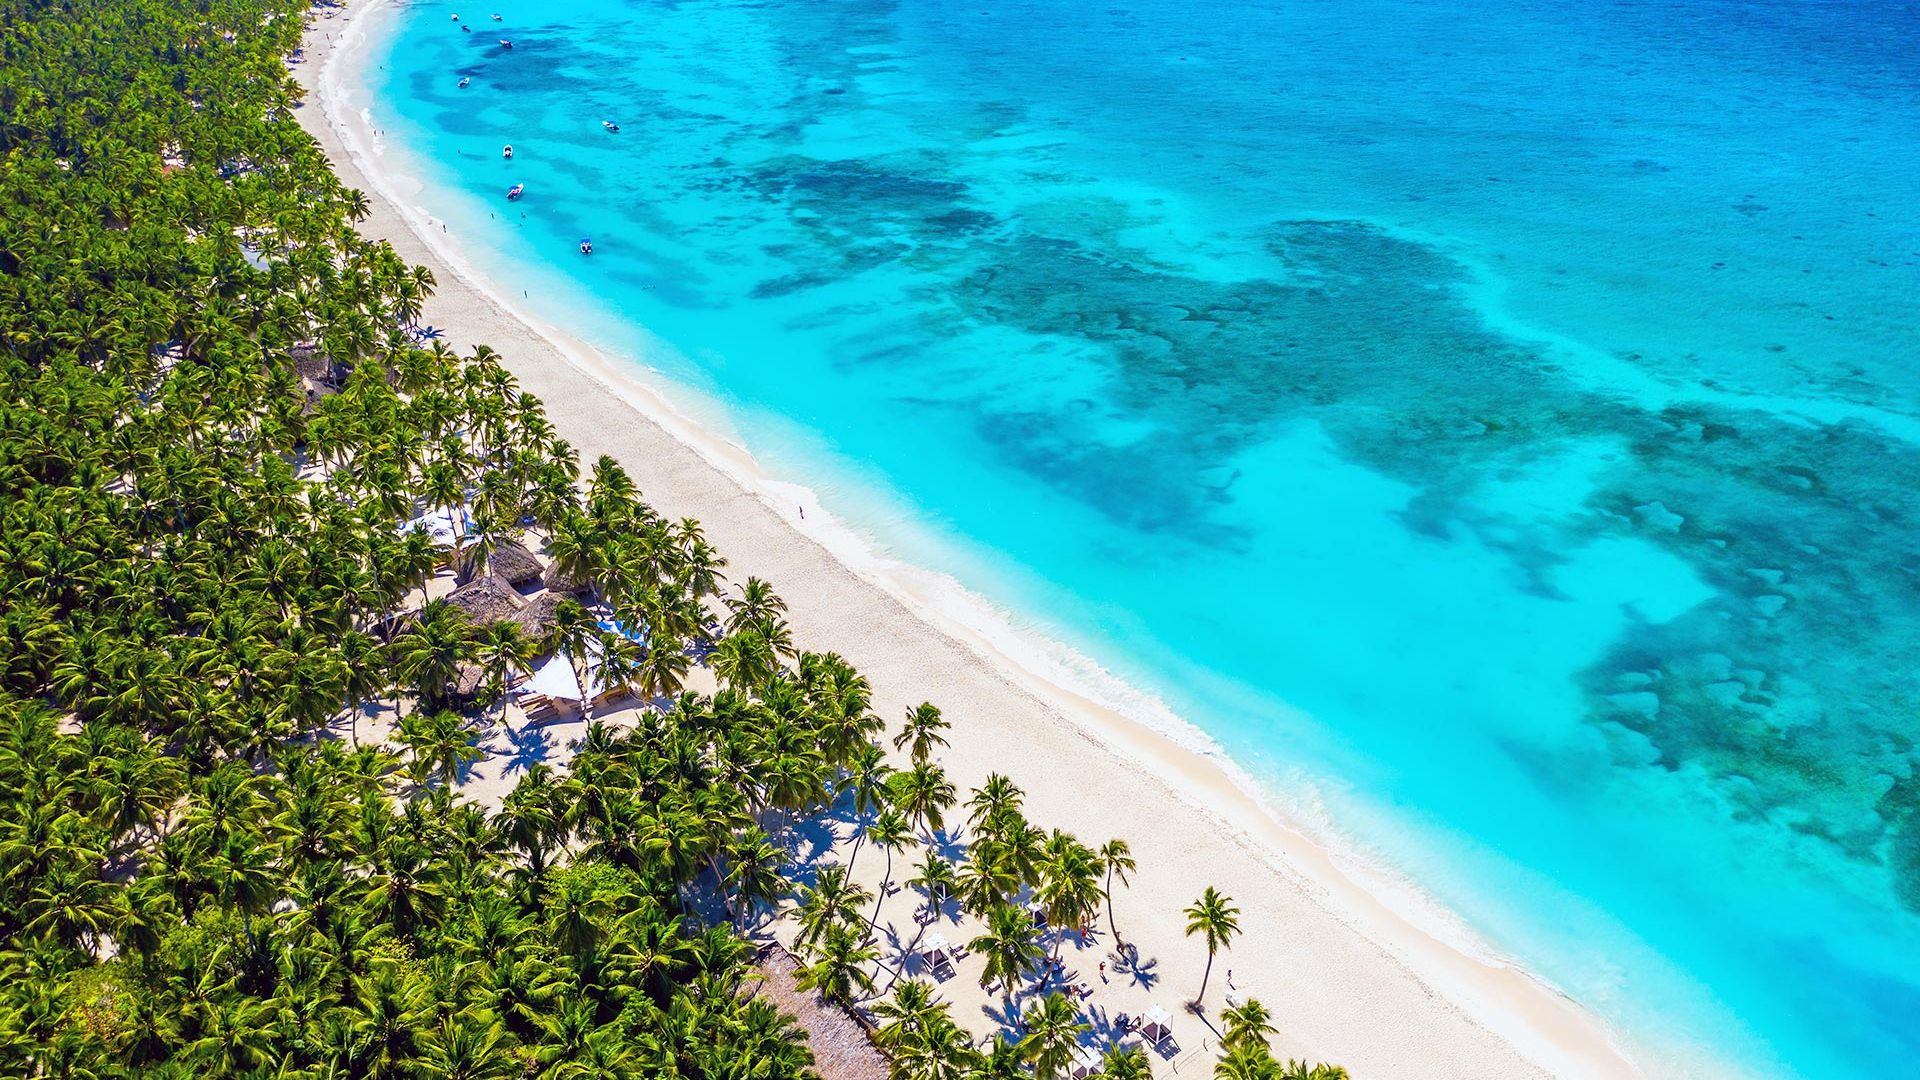 Sejur charter Bahia Principe Resort Punta Cana, 9 zile - octombrie 2021